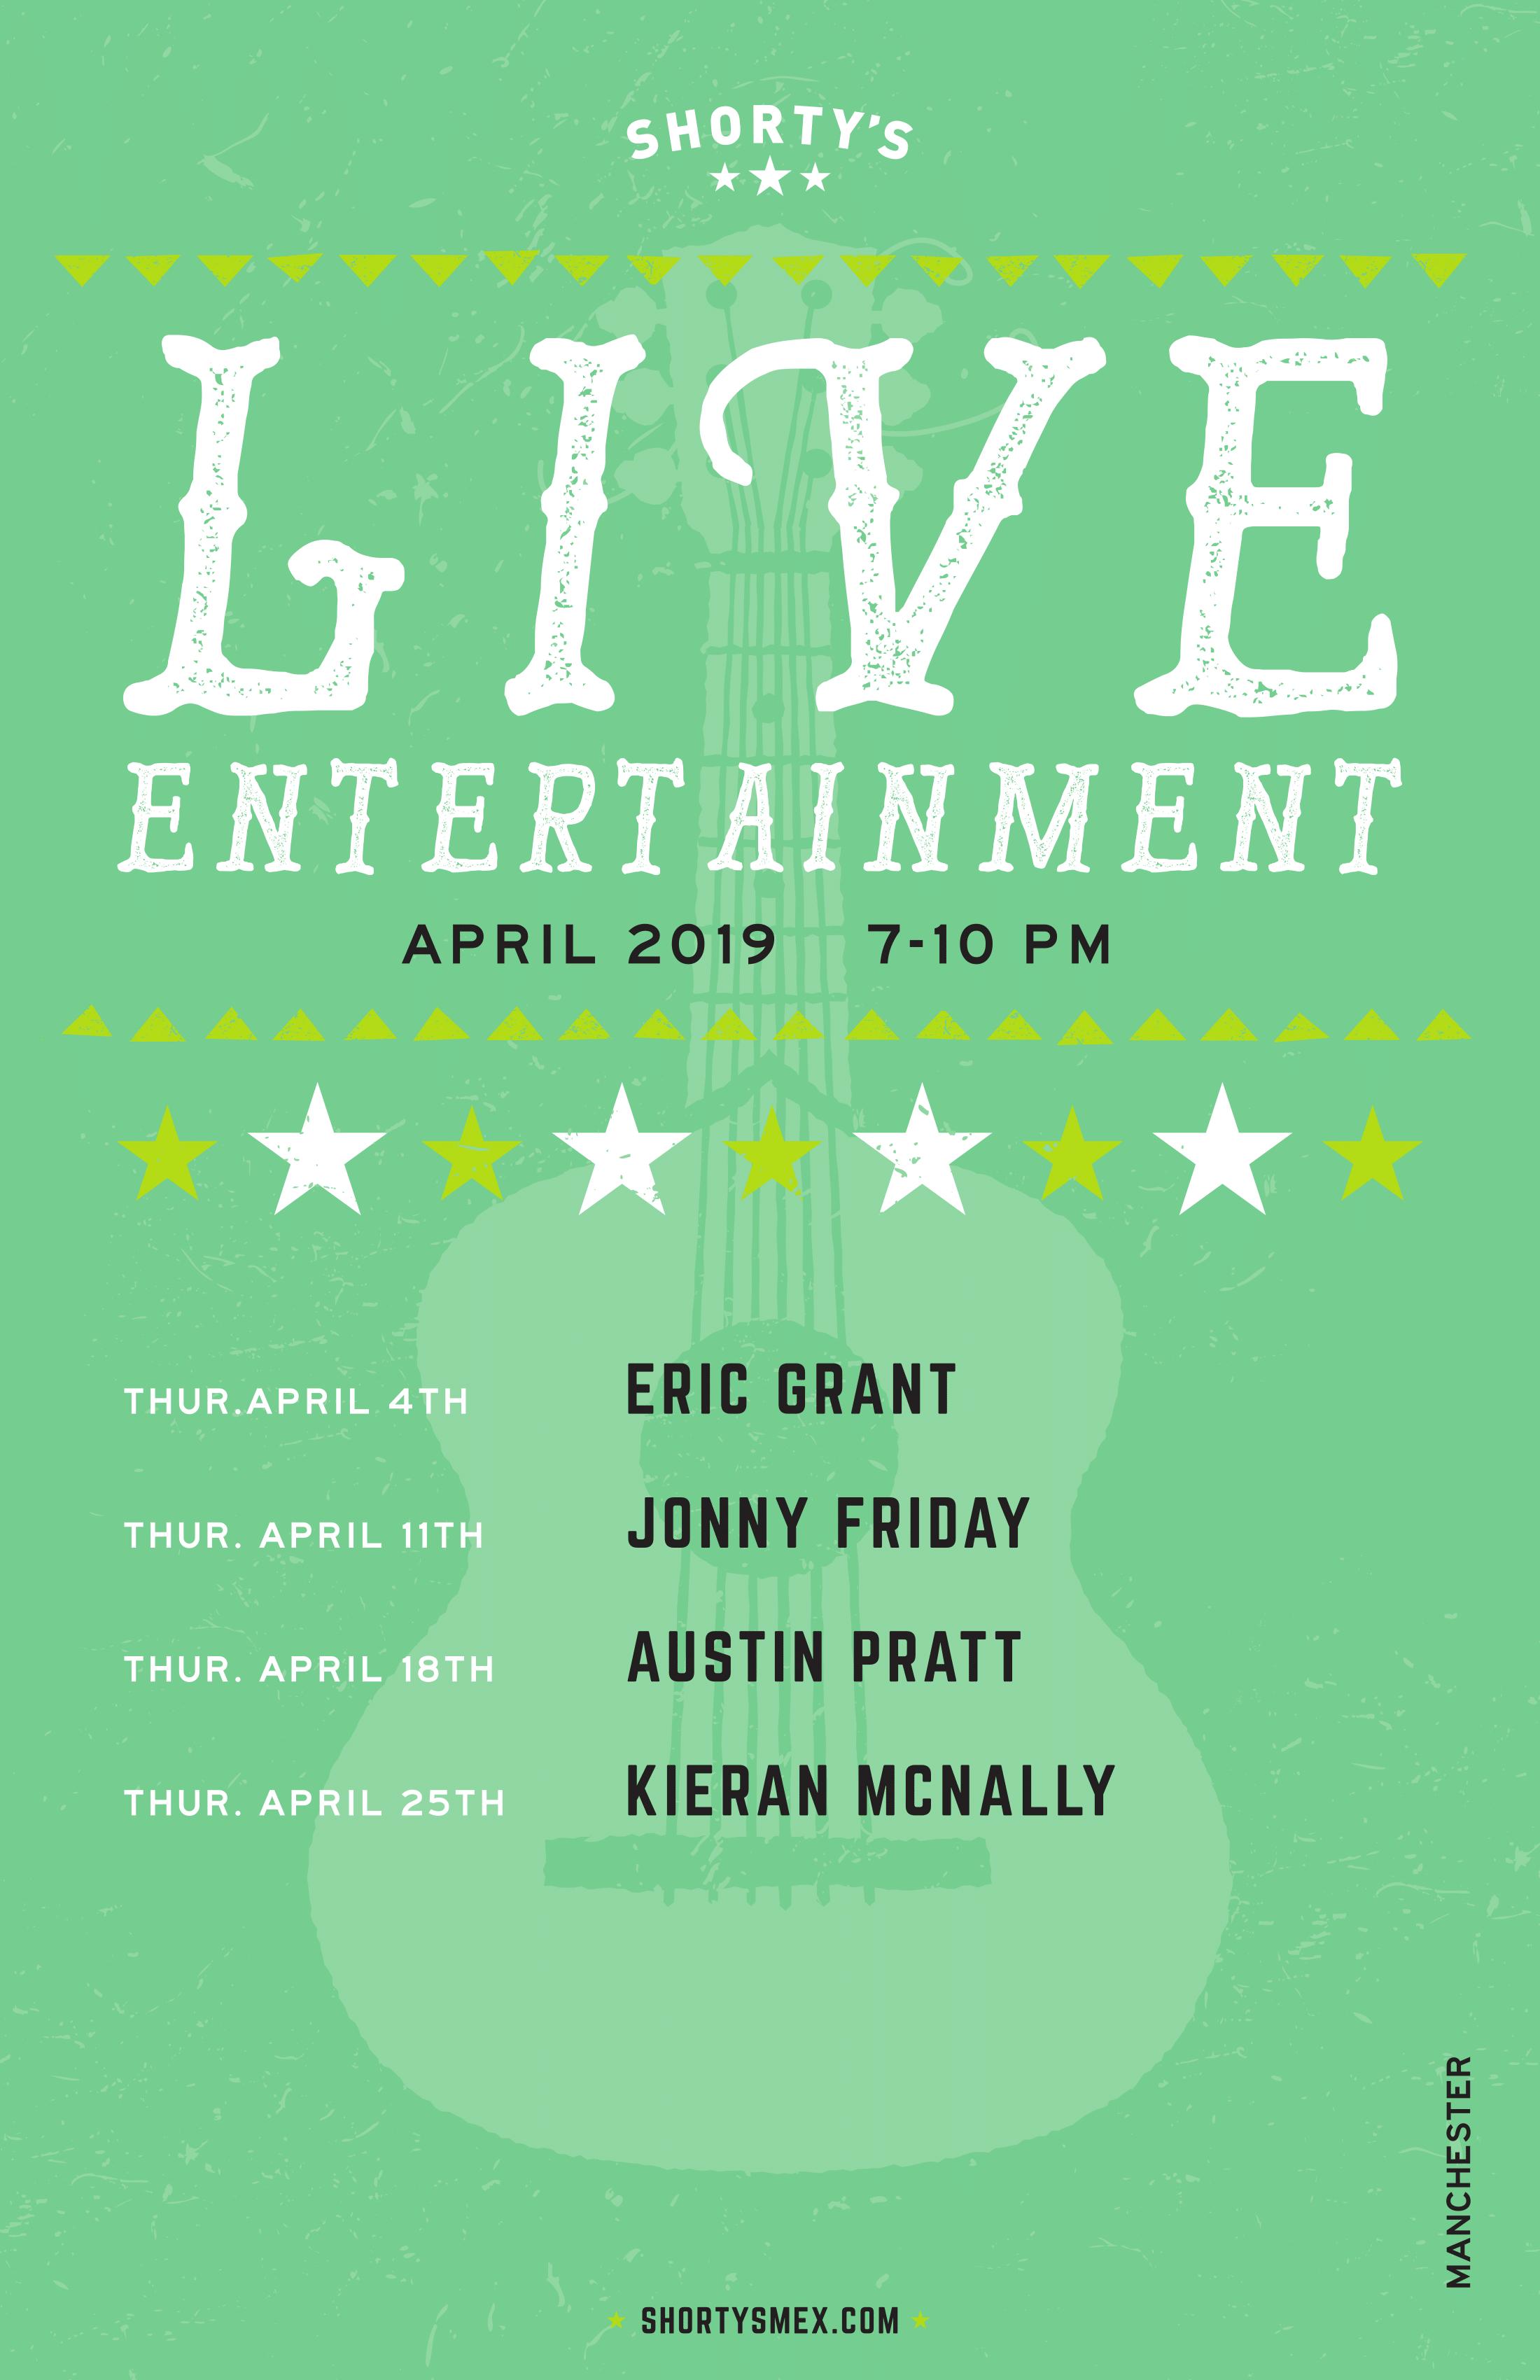 Shorty's Live Entertainment Calendar - April in Manchester